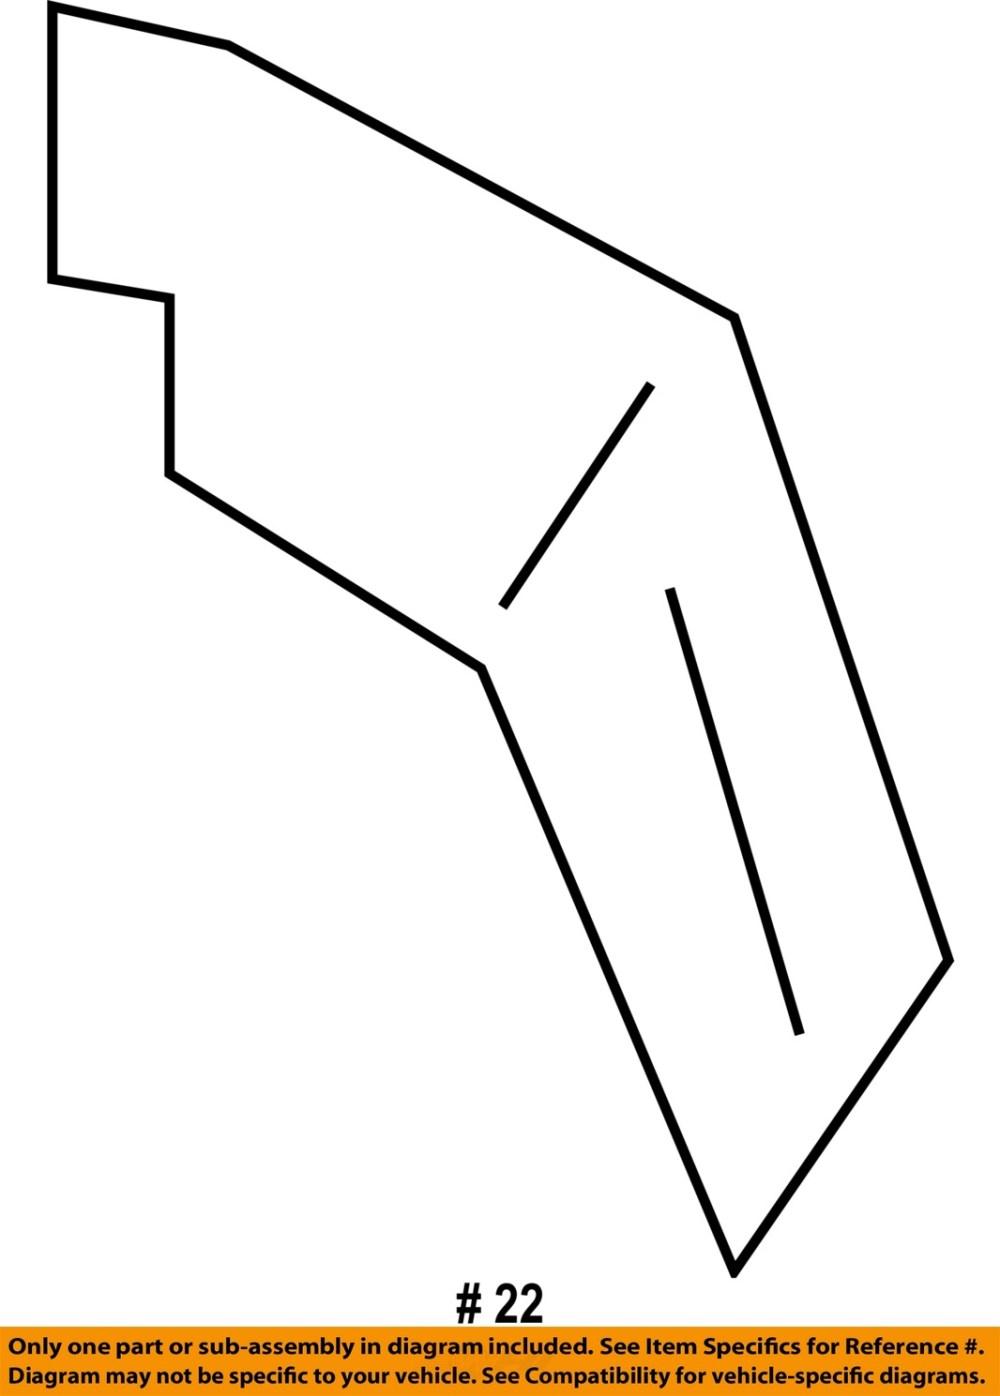 medium resolution of  22 on diagram only genuine oe factory original item